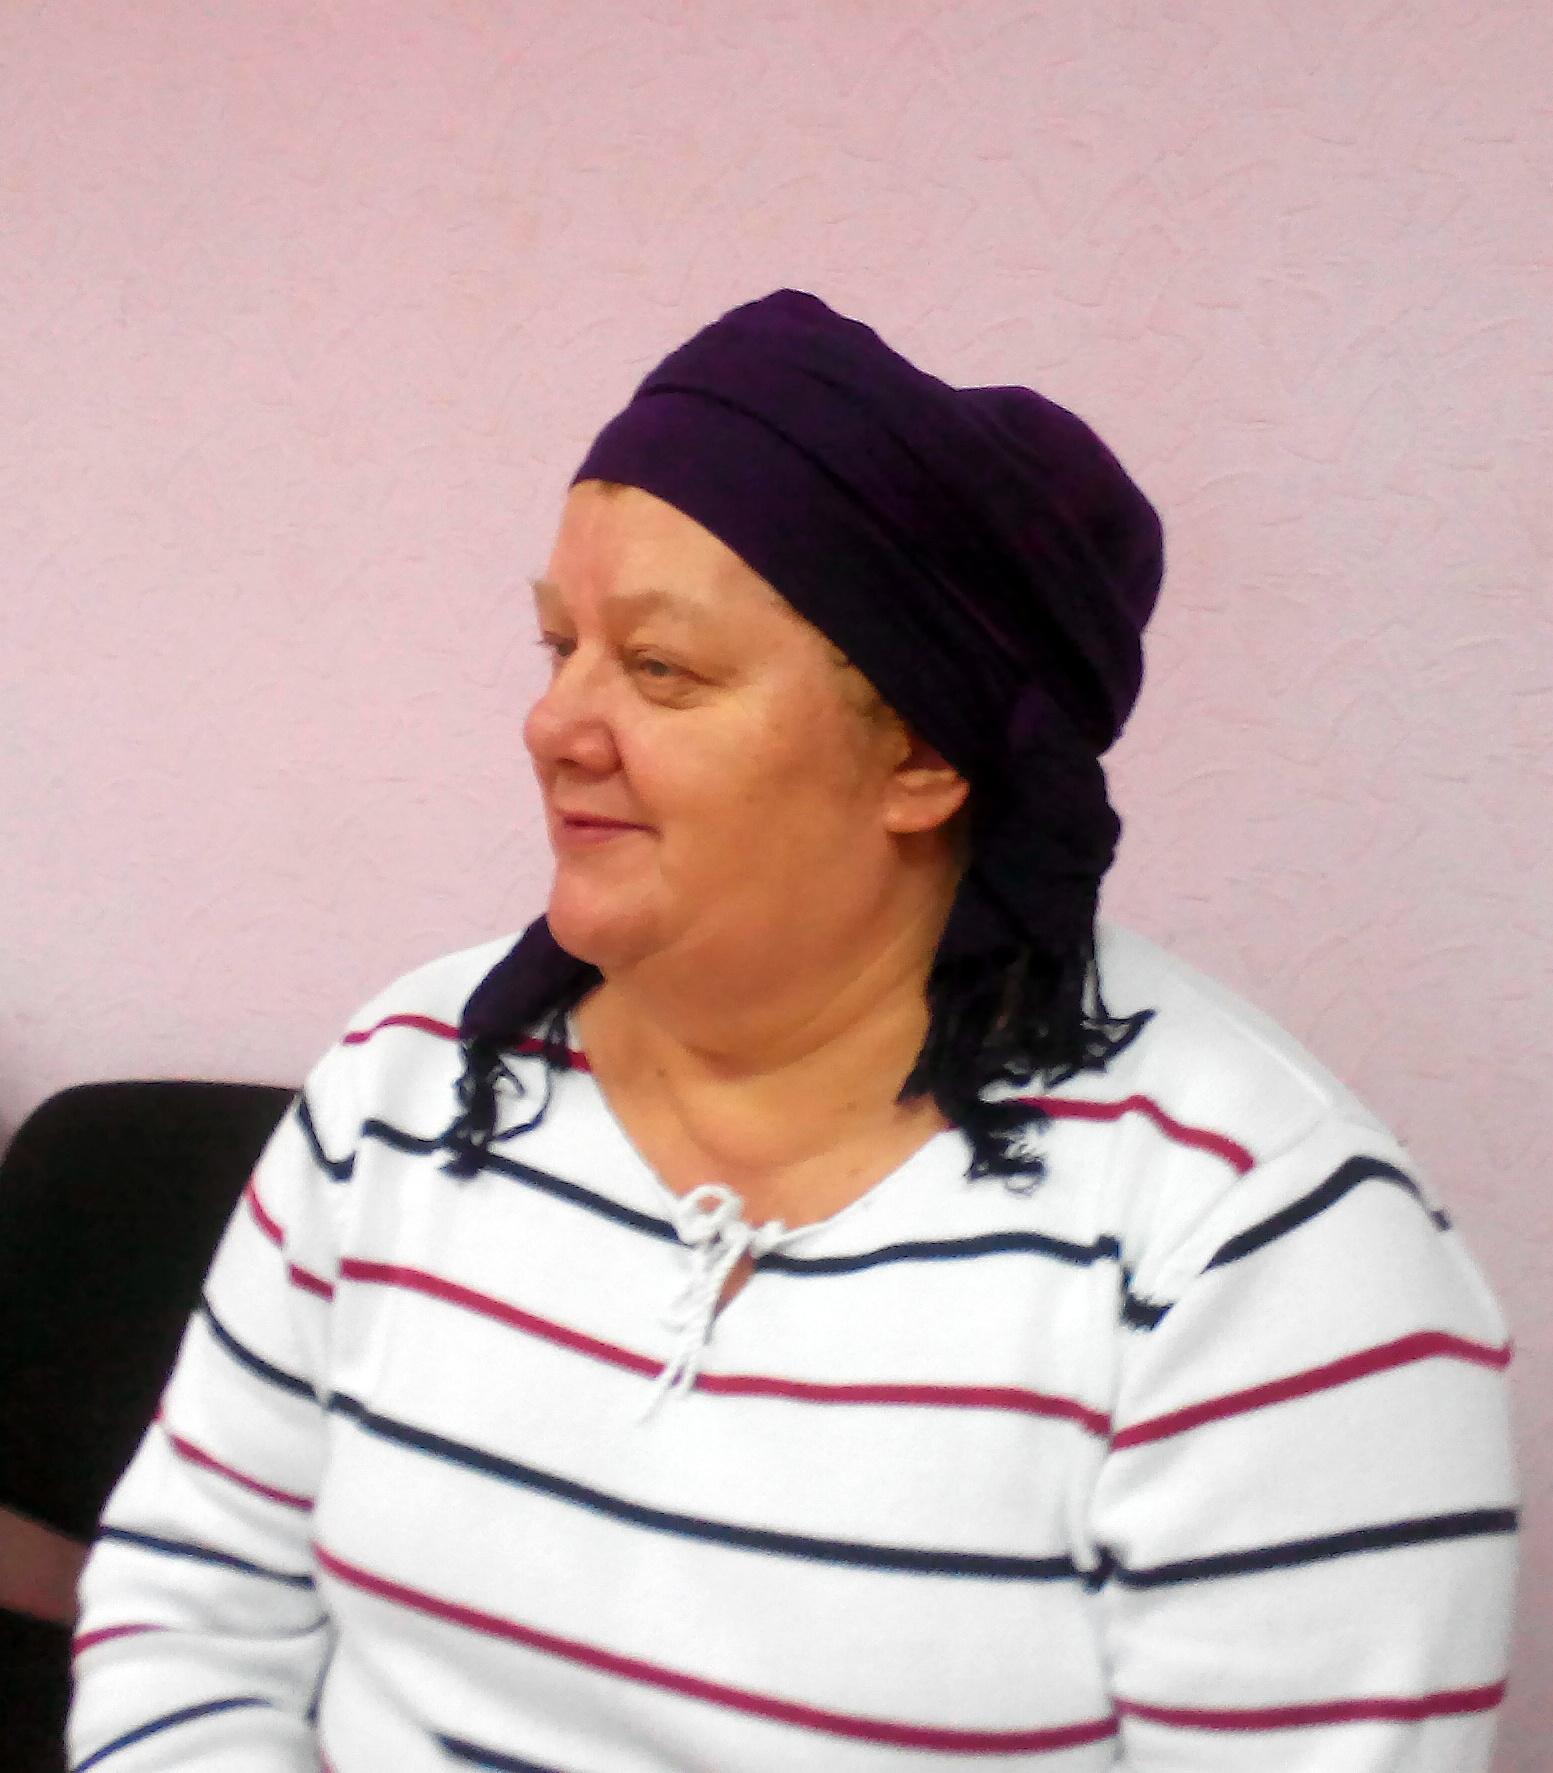 Барышникова Надежда Анатольевна